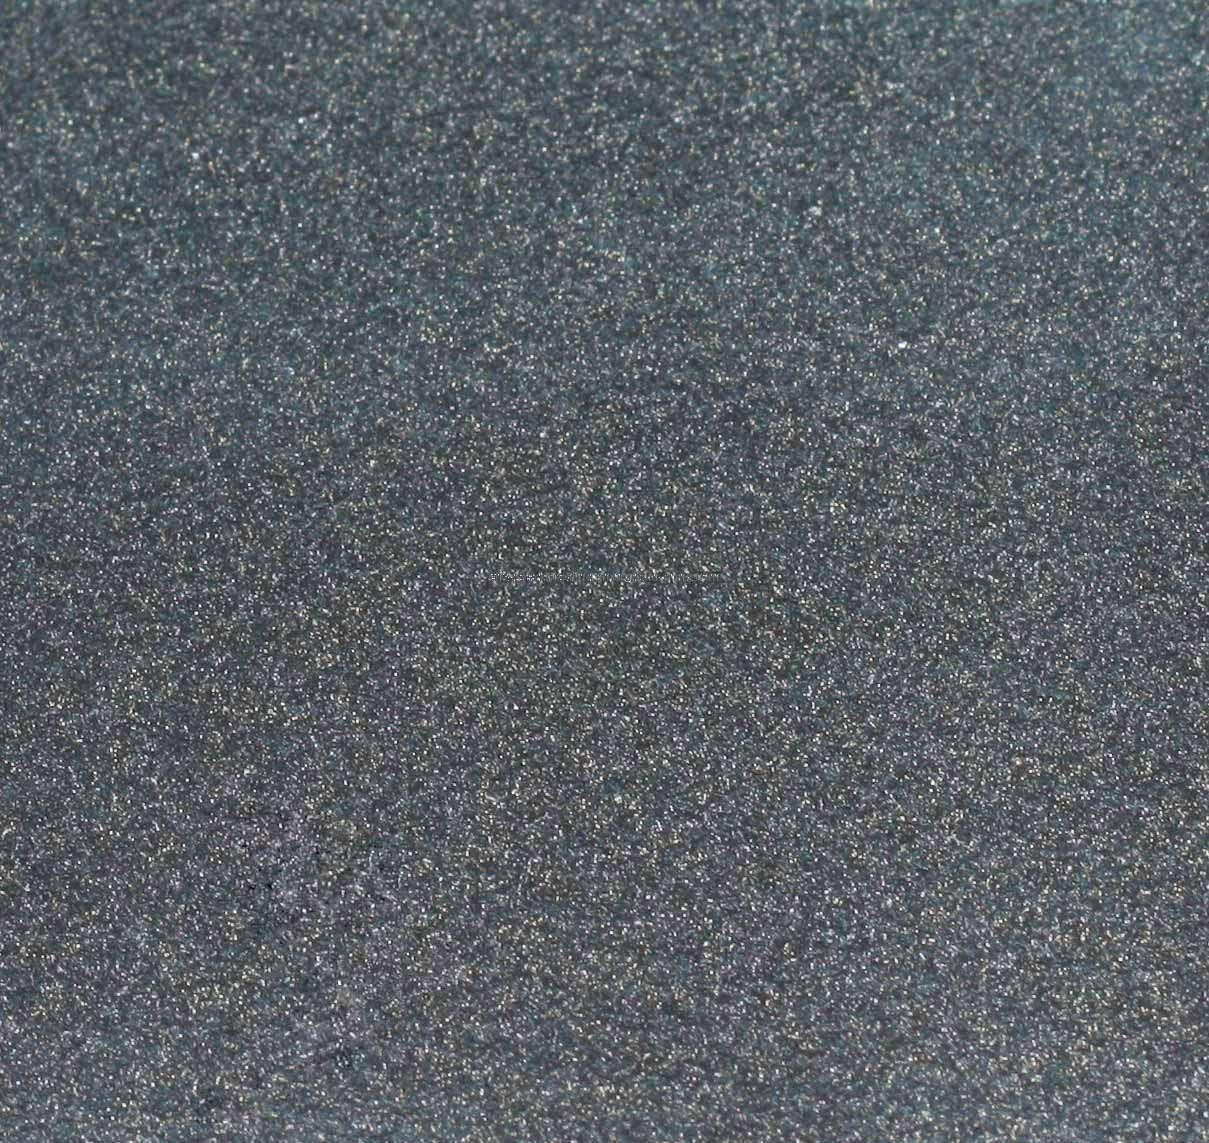 Powdered Coated Aluminium Texture : China black sand texture powder coating for metal e